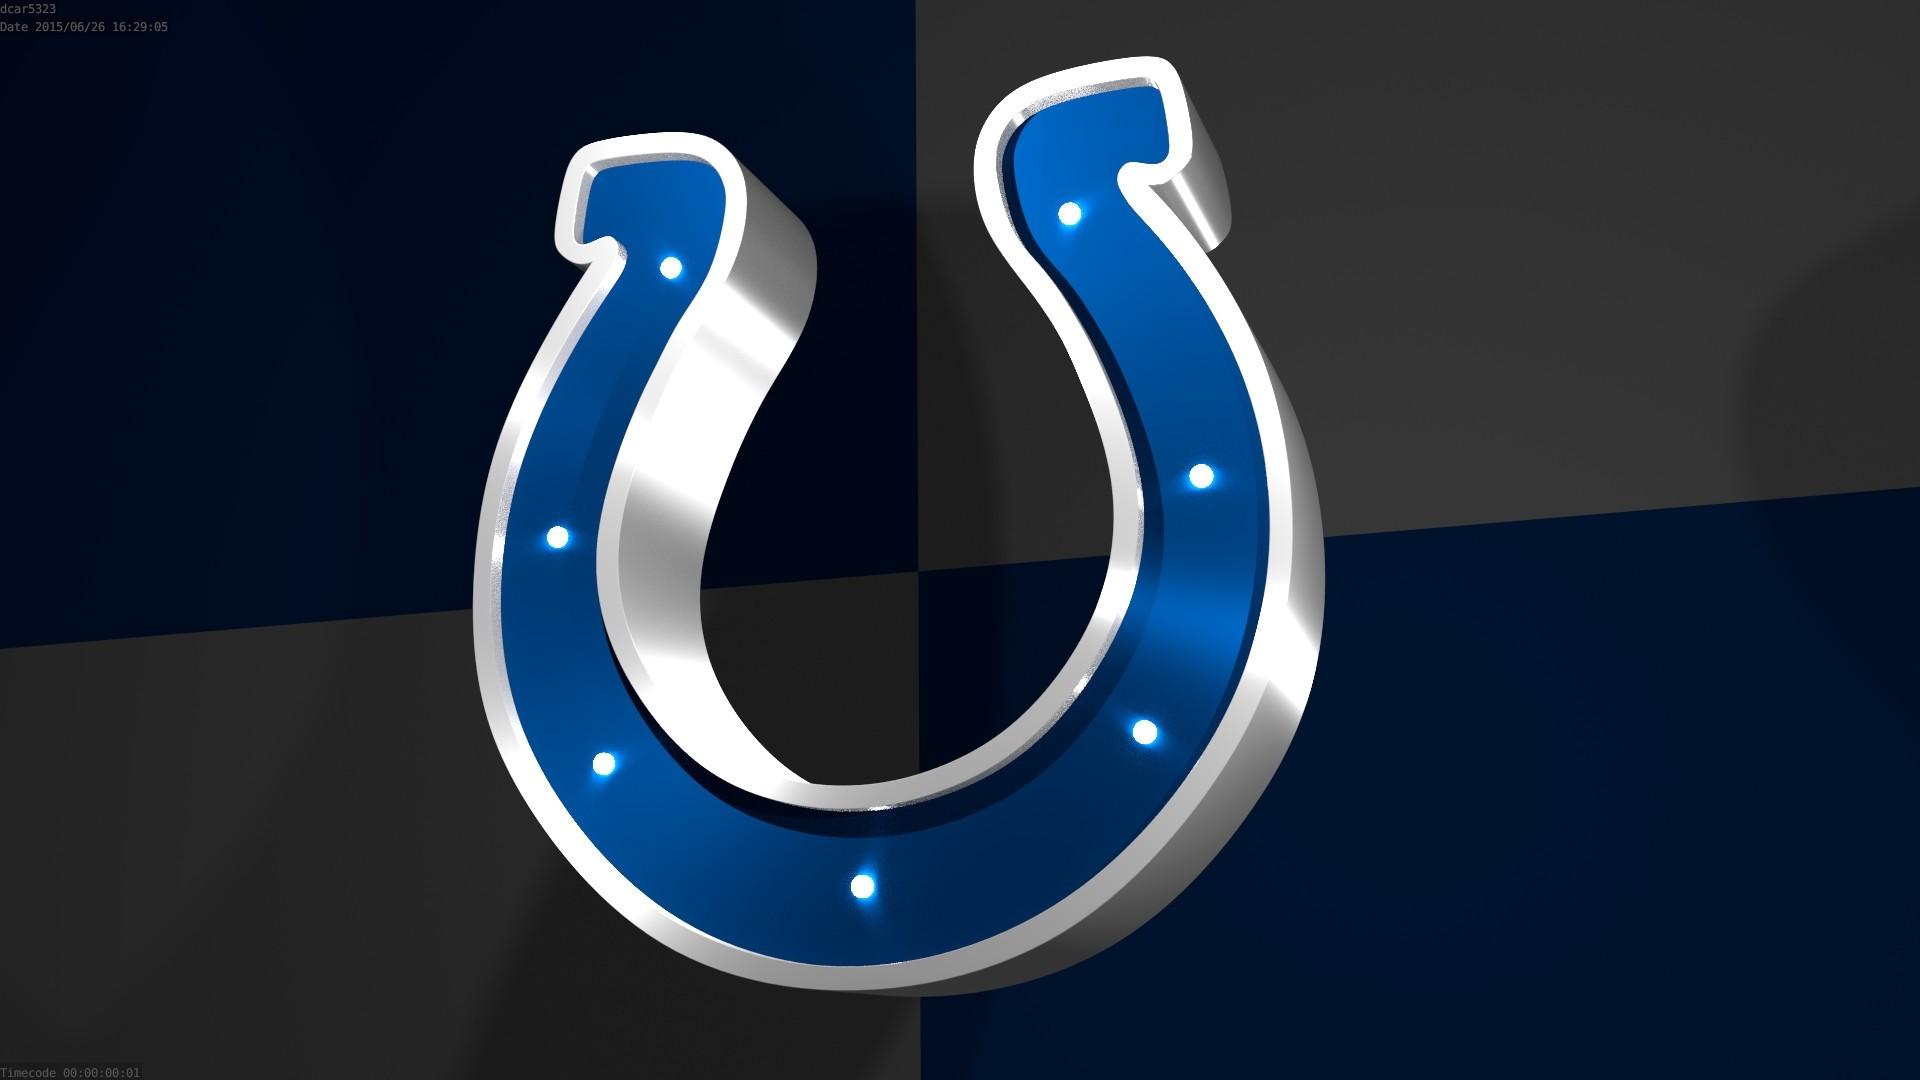 Colts HD Download